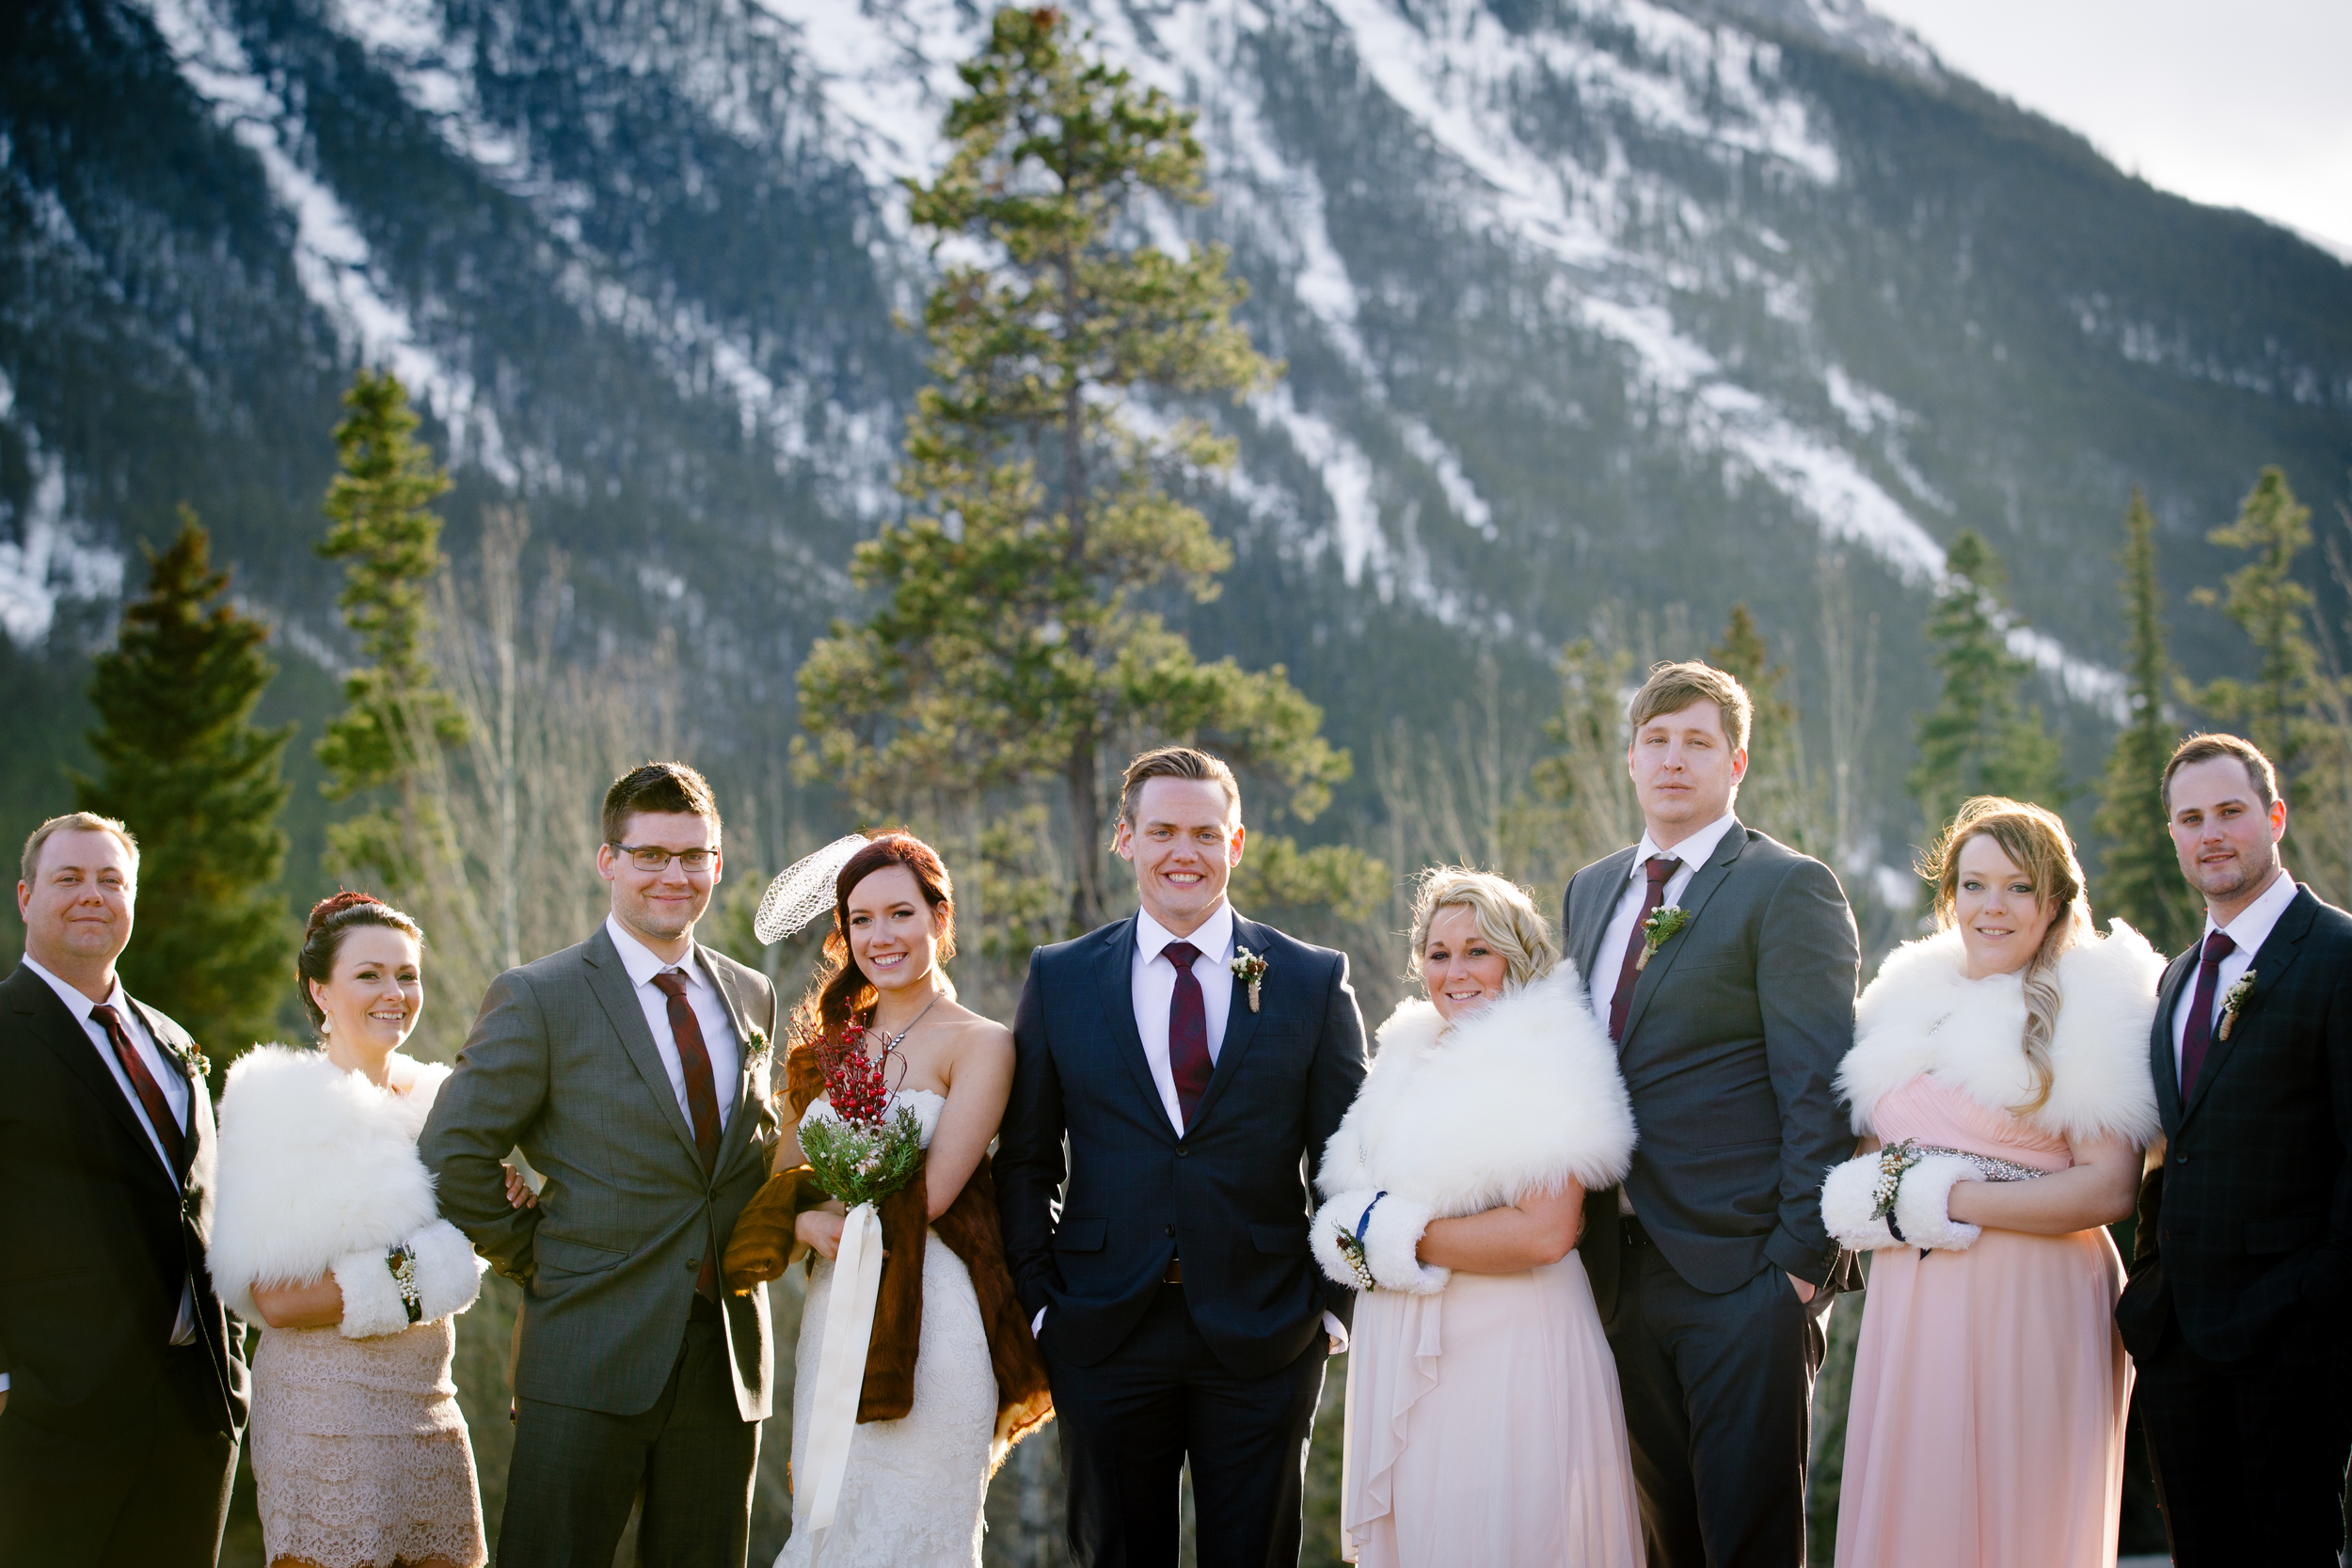 SharaiSiemens_Photography_Wedding_AndrewSarah59.jpg